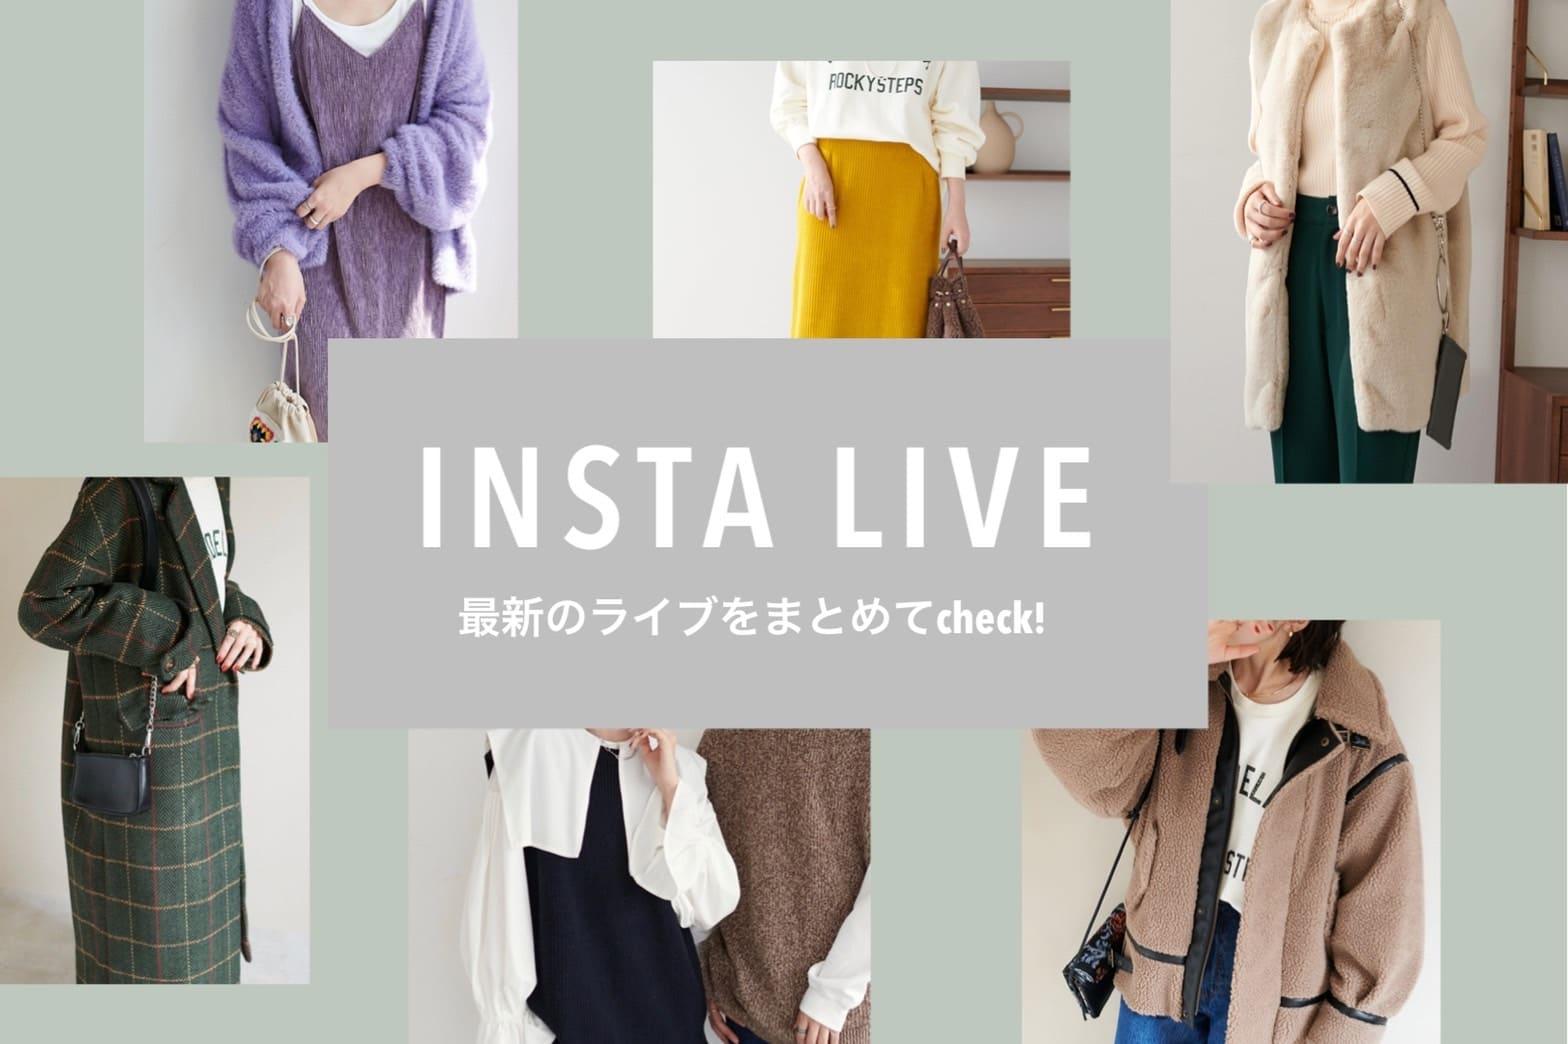 Discoat 【INSTA LIVE】最新の配信をまとめてCHECK!